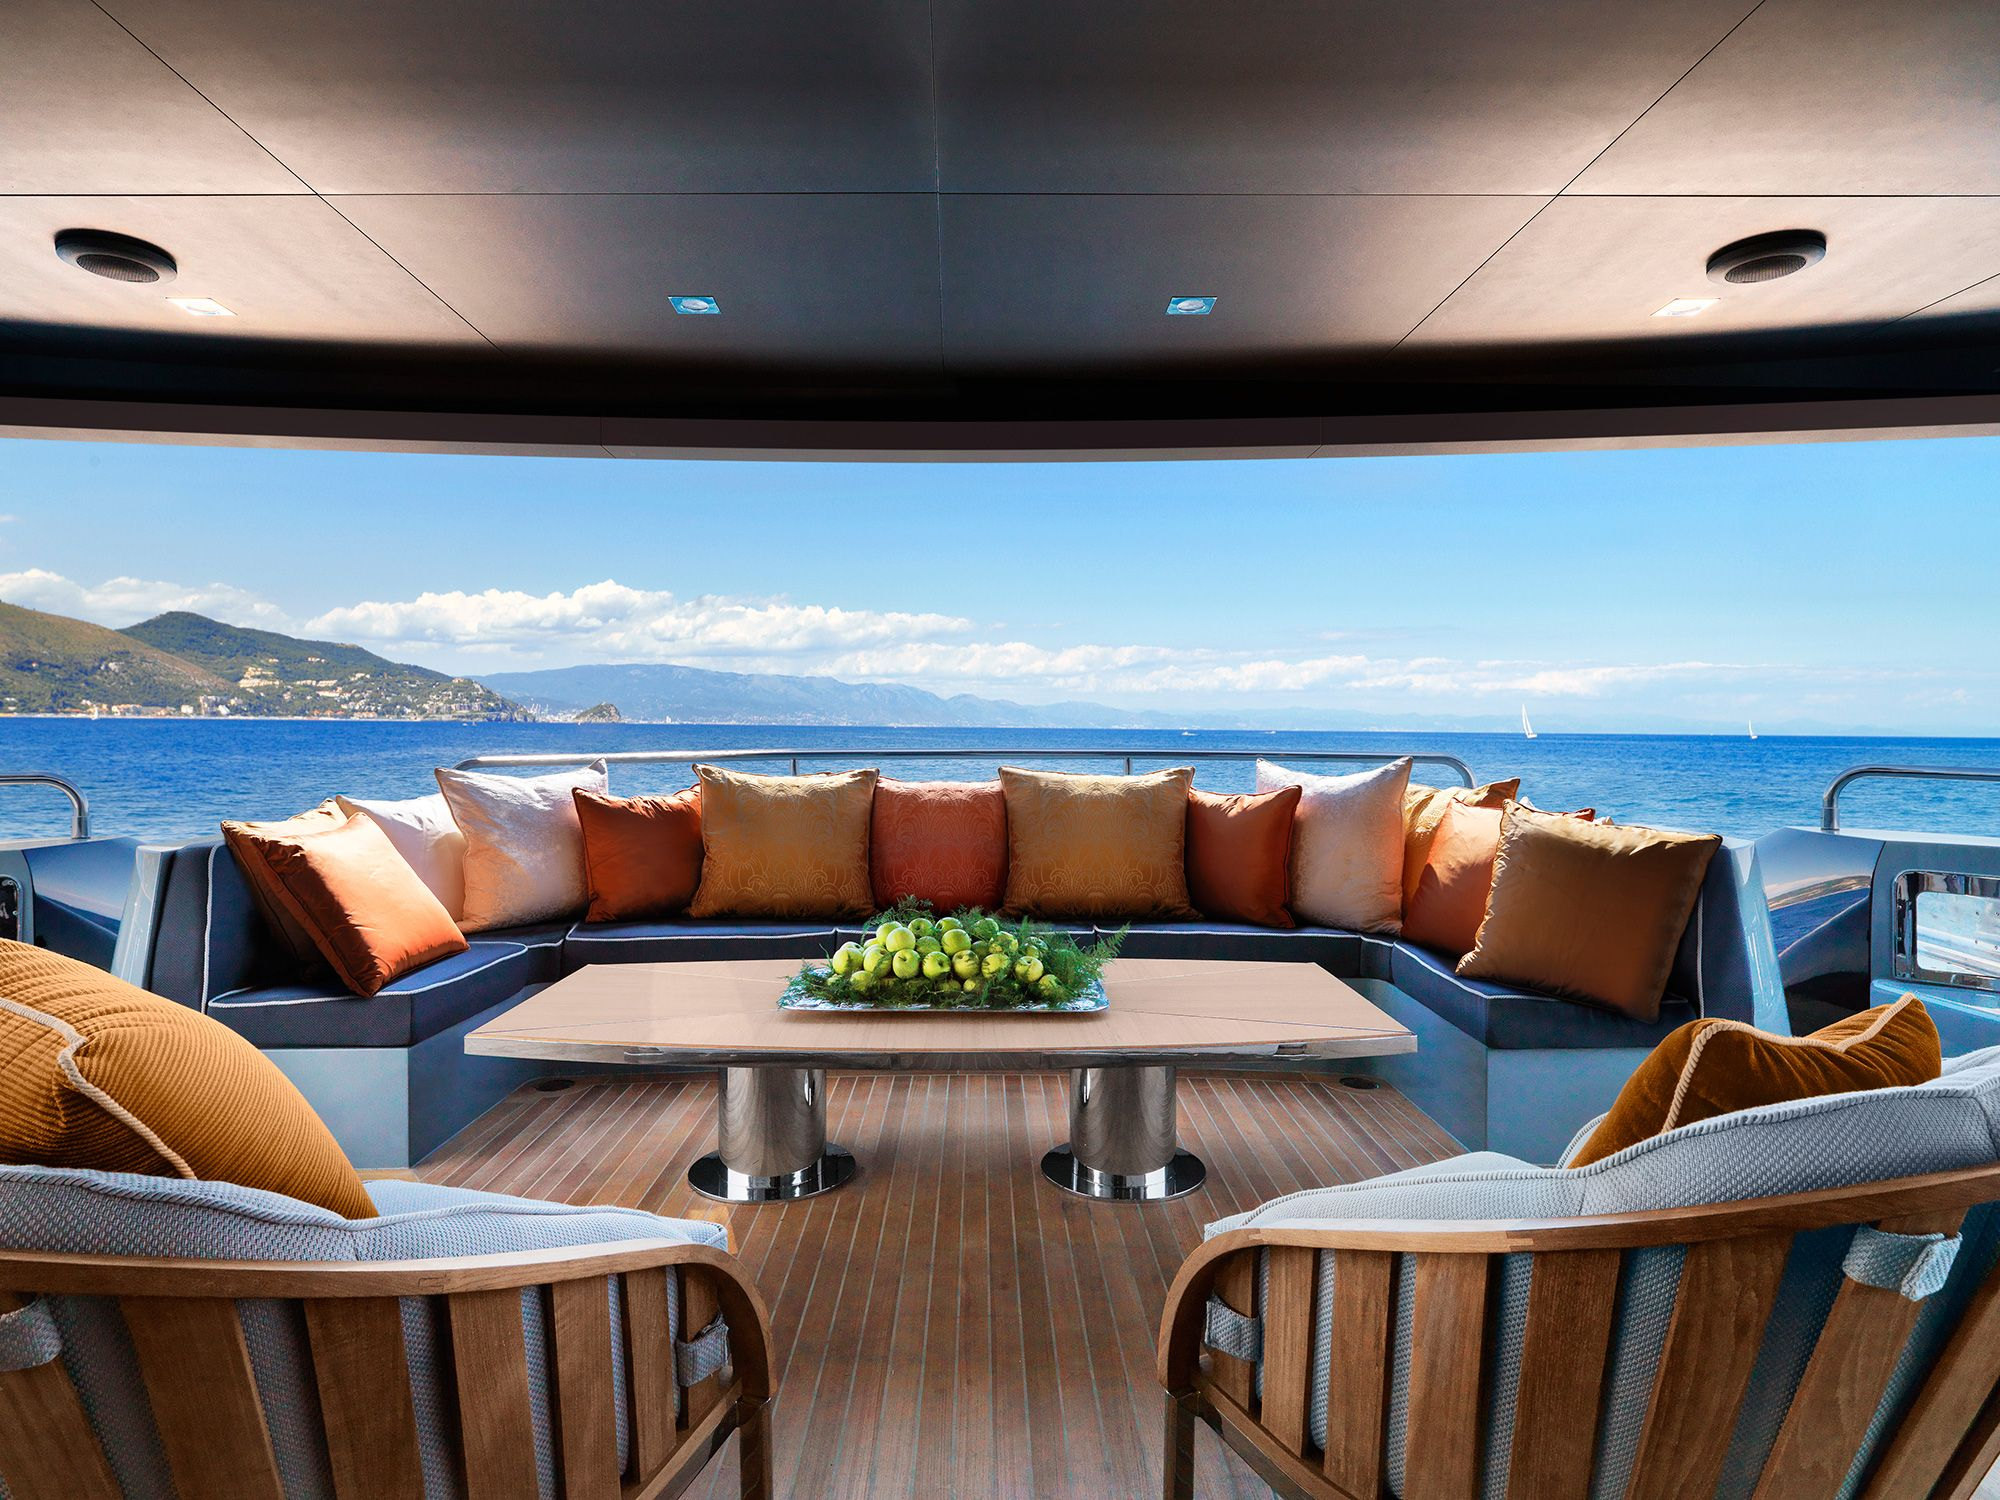 Explore Yacht Interior, Interior Design, And More!